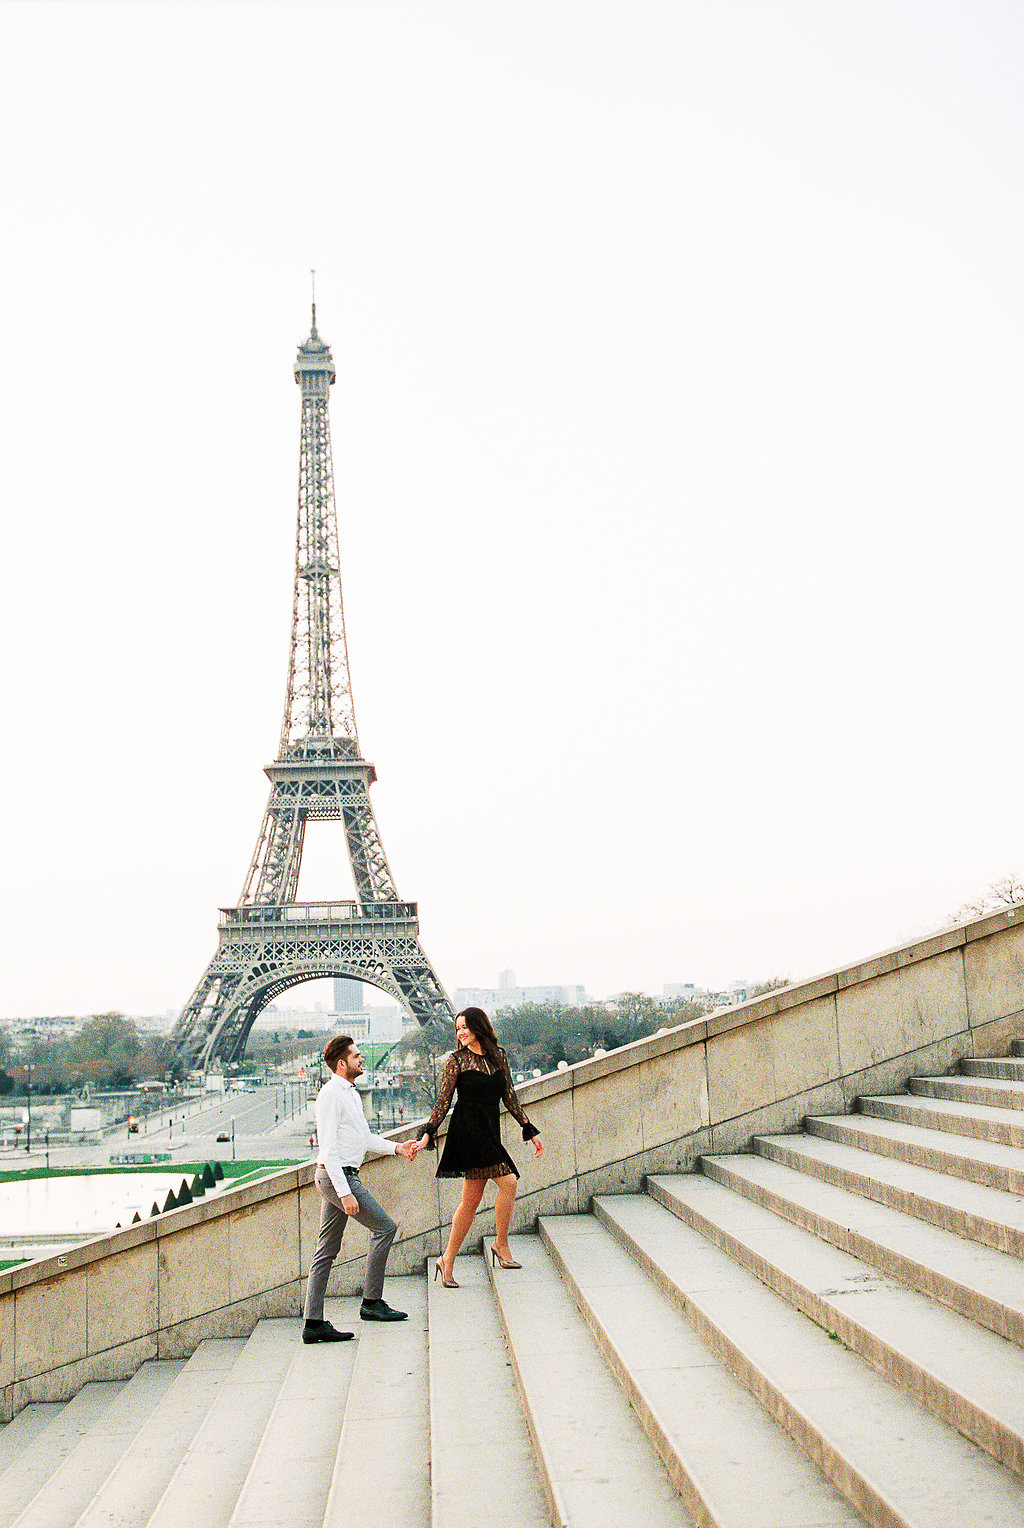 Germany fine art film wedding photographer | Kibogo Photography | Paris engagement session19.JPG